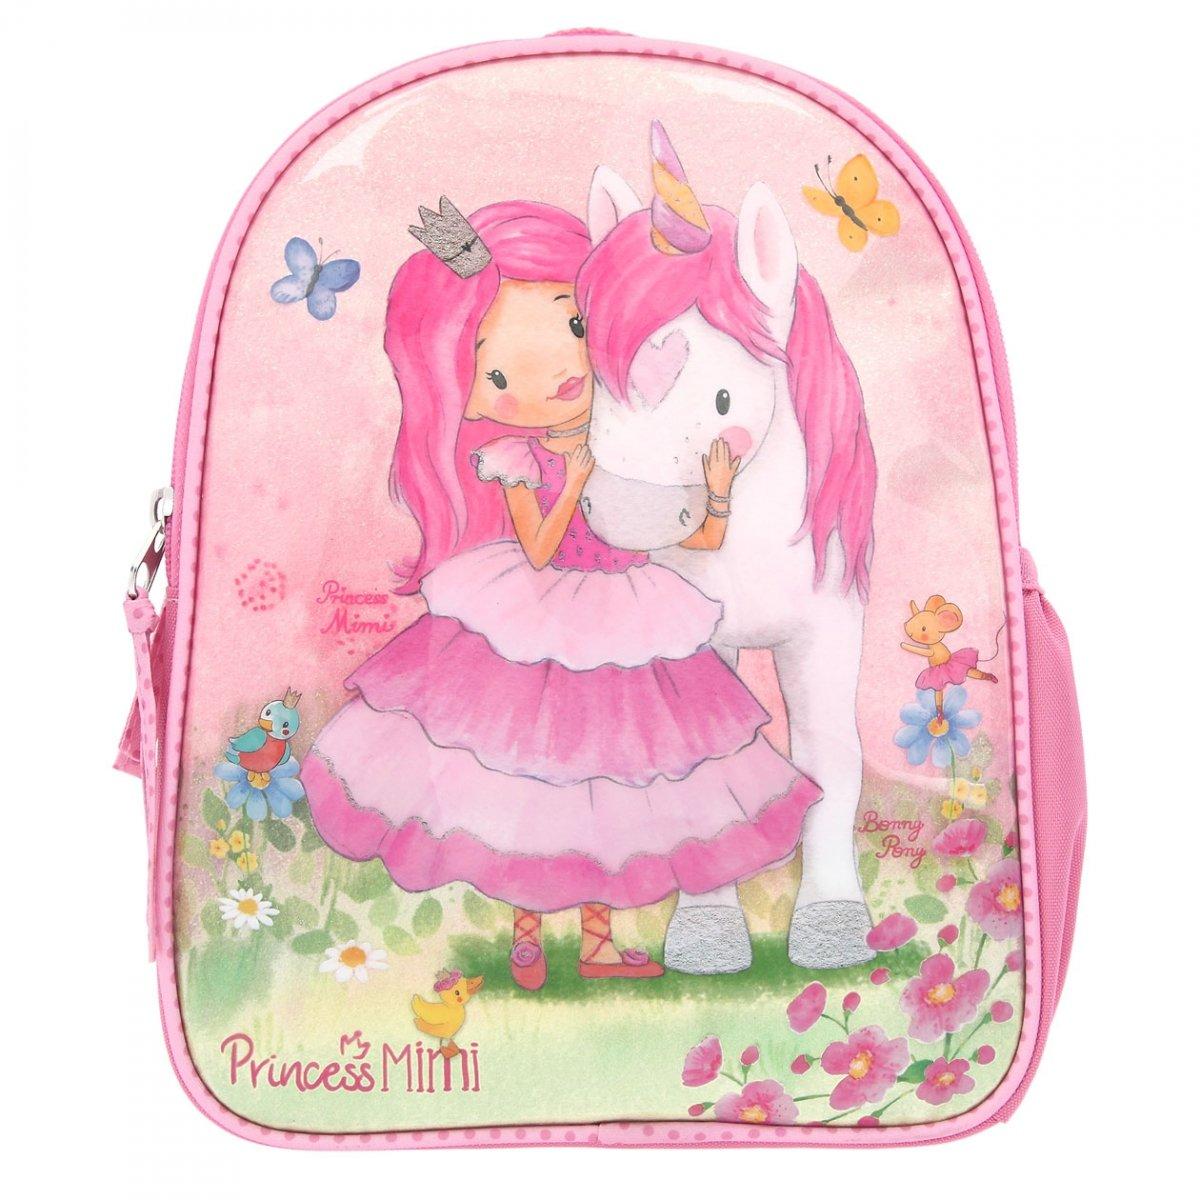 Princess Mimi - Backpack (0411334)